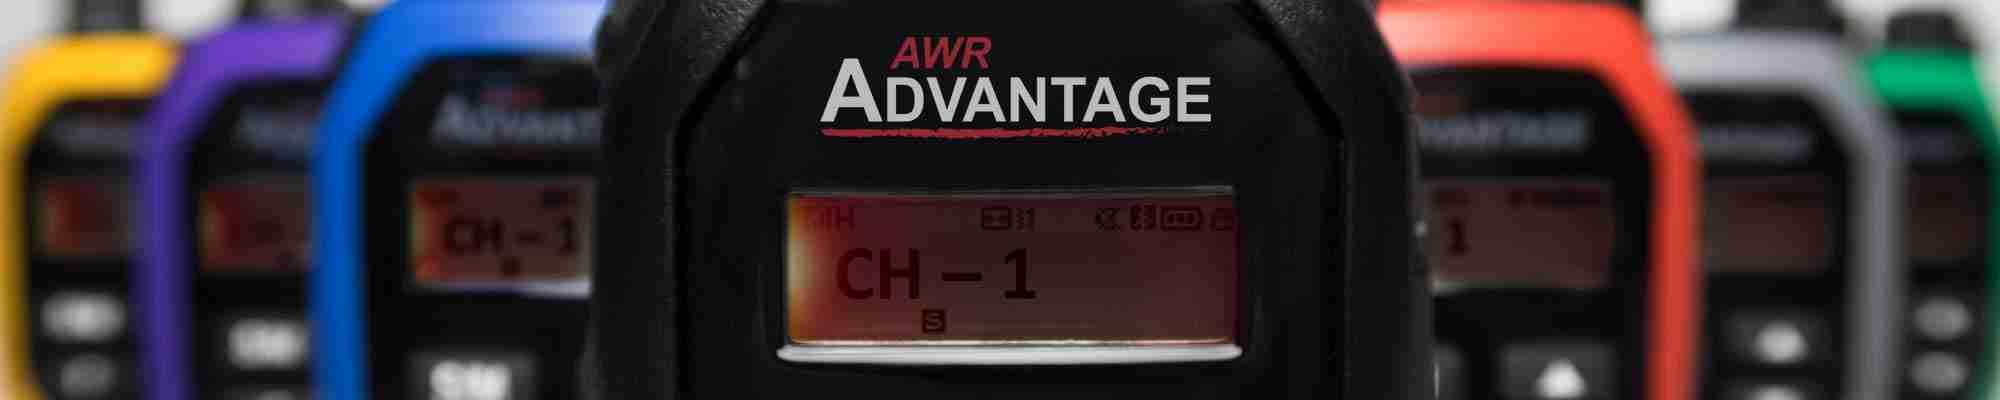 AWR Advantage Banner Image